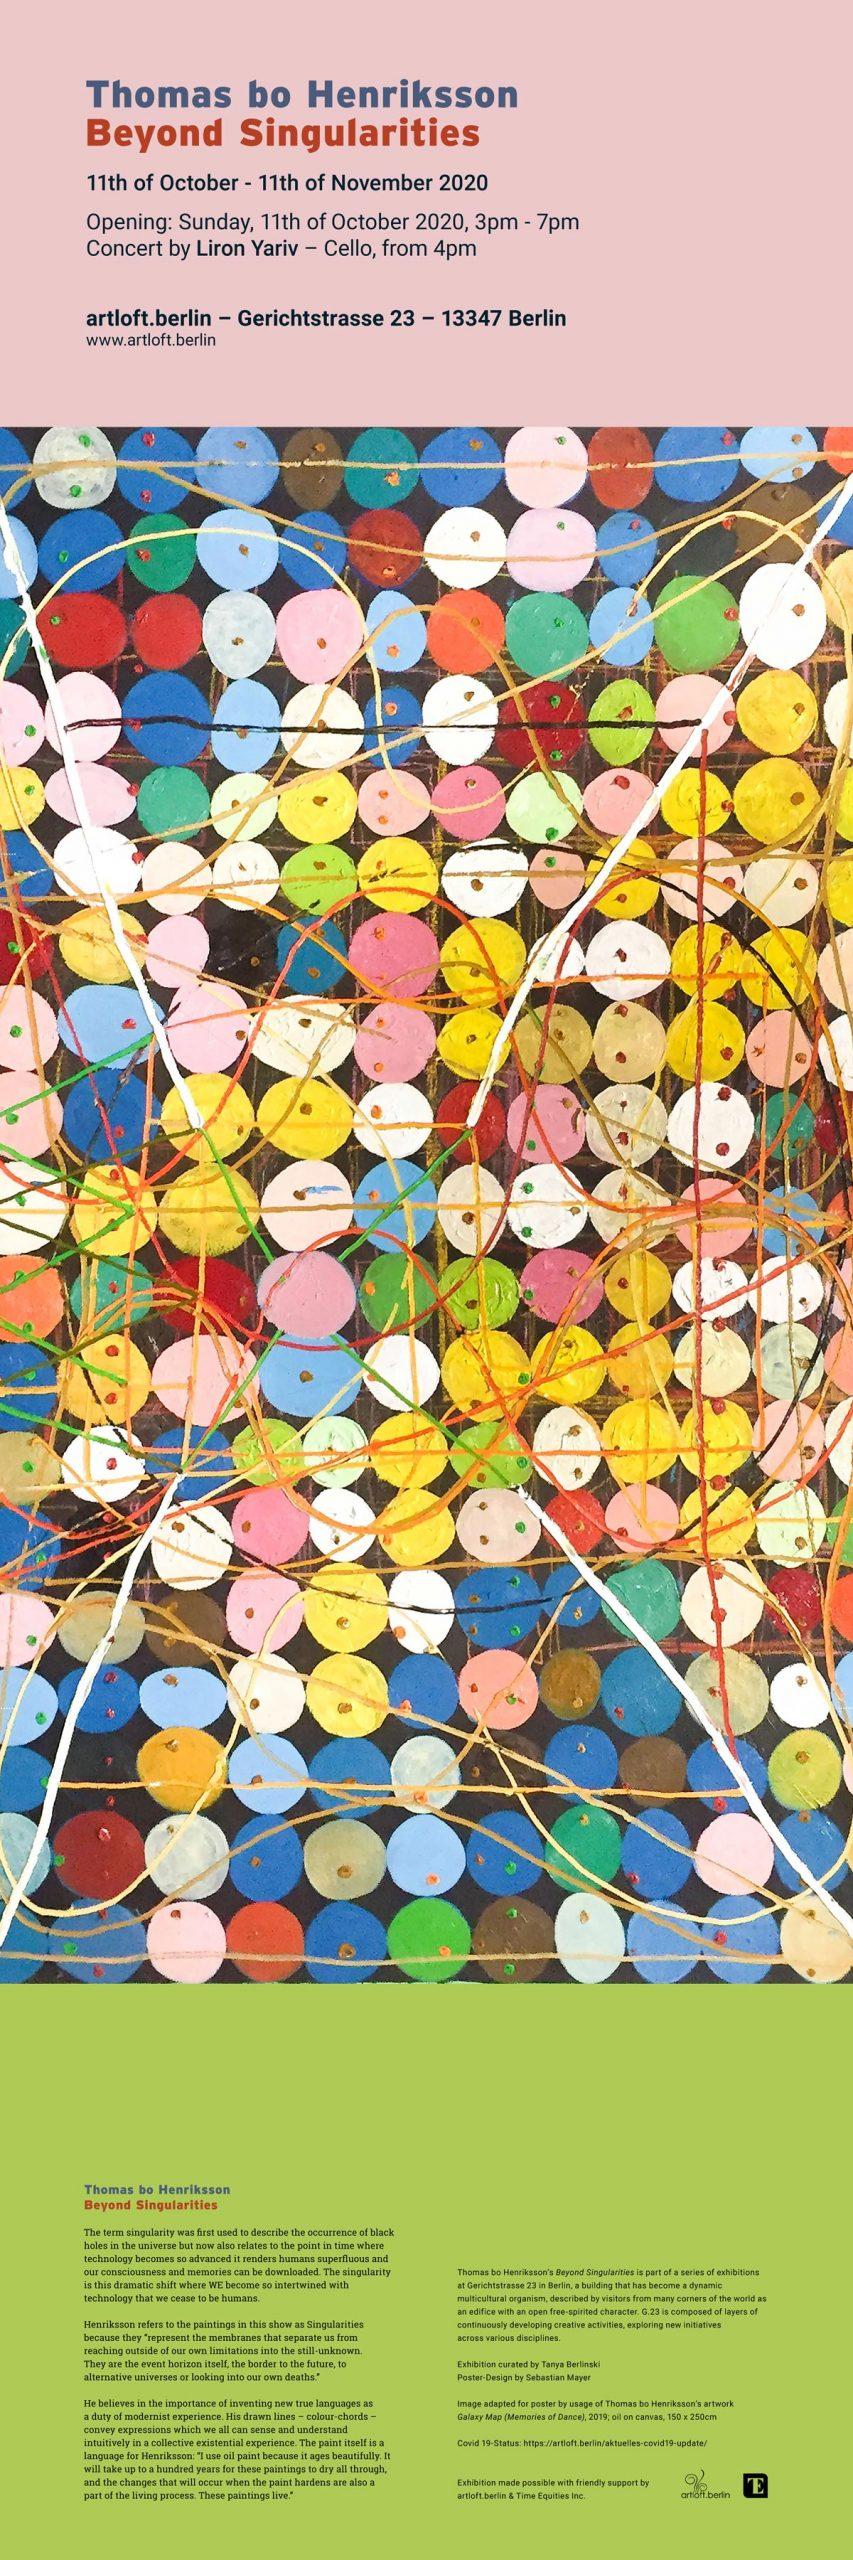 Thomas Bo Henriksson - Ausstellung im artloft.berlin